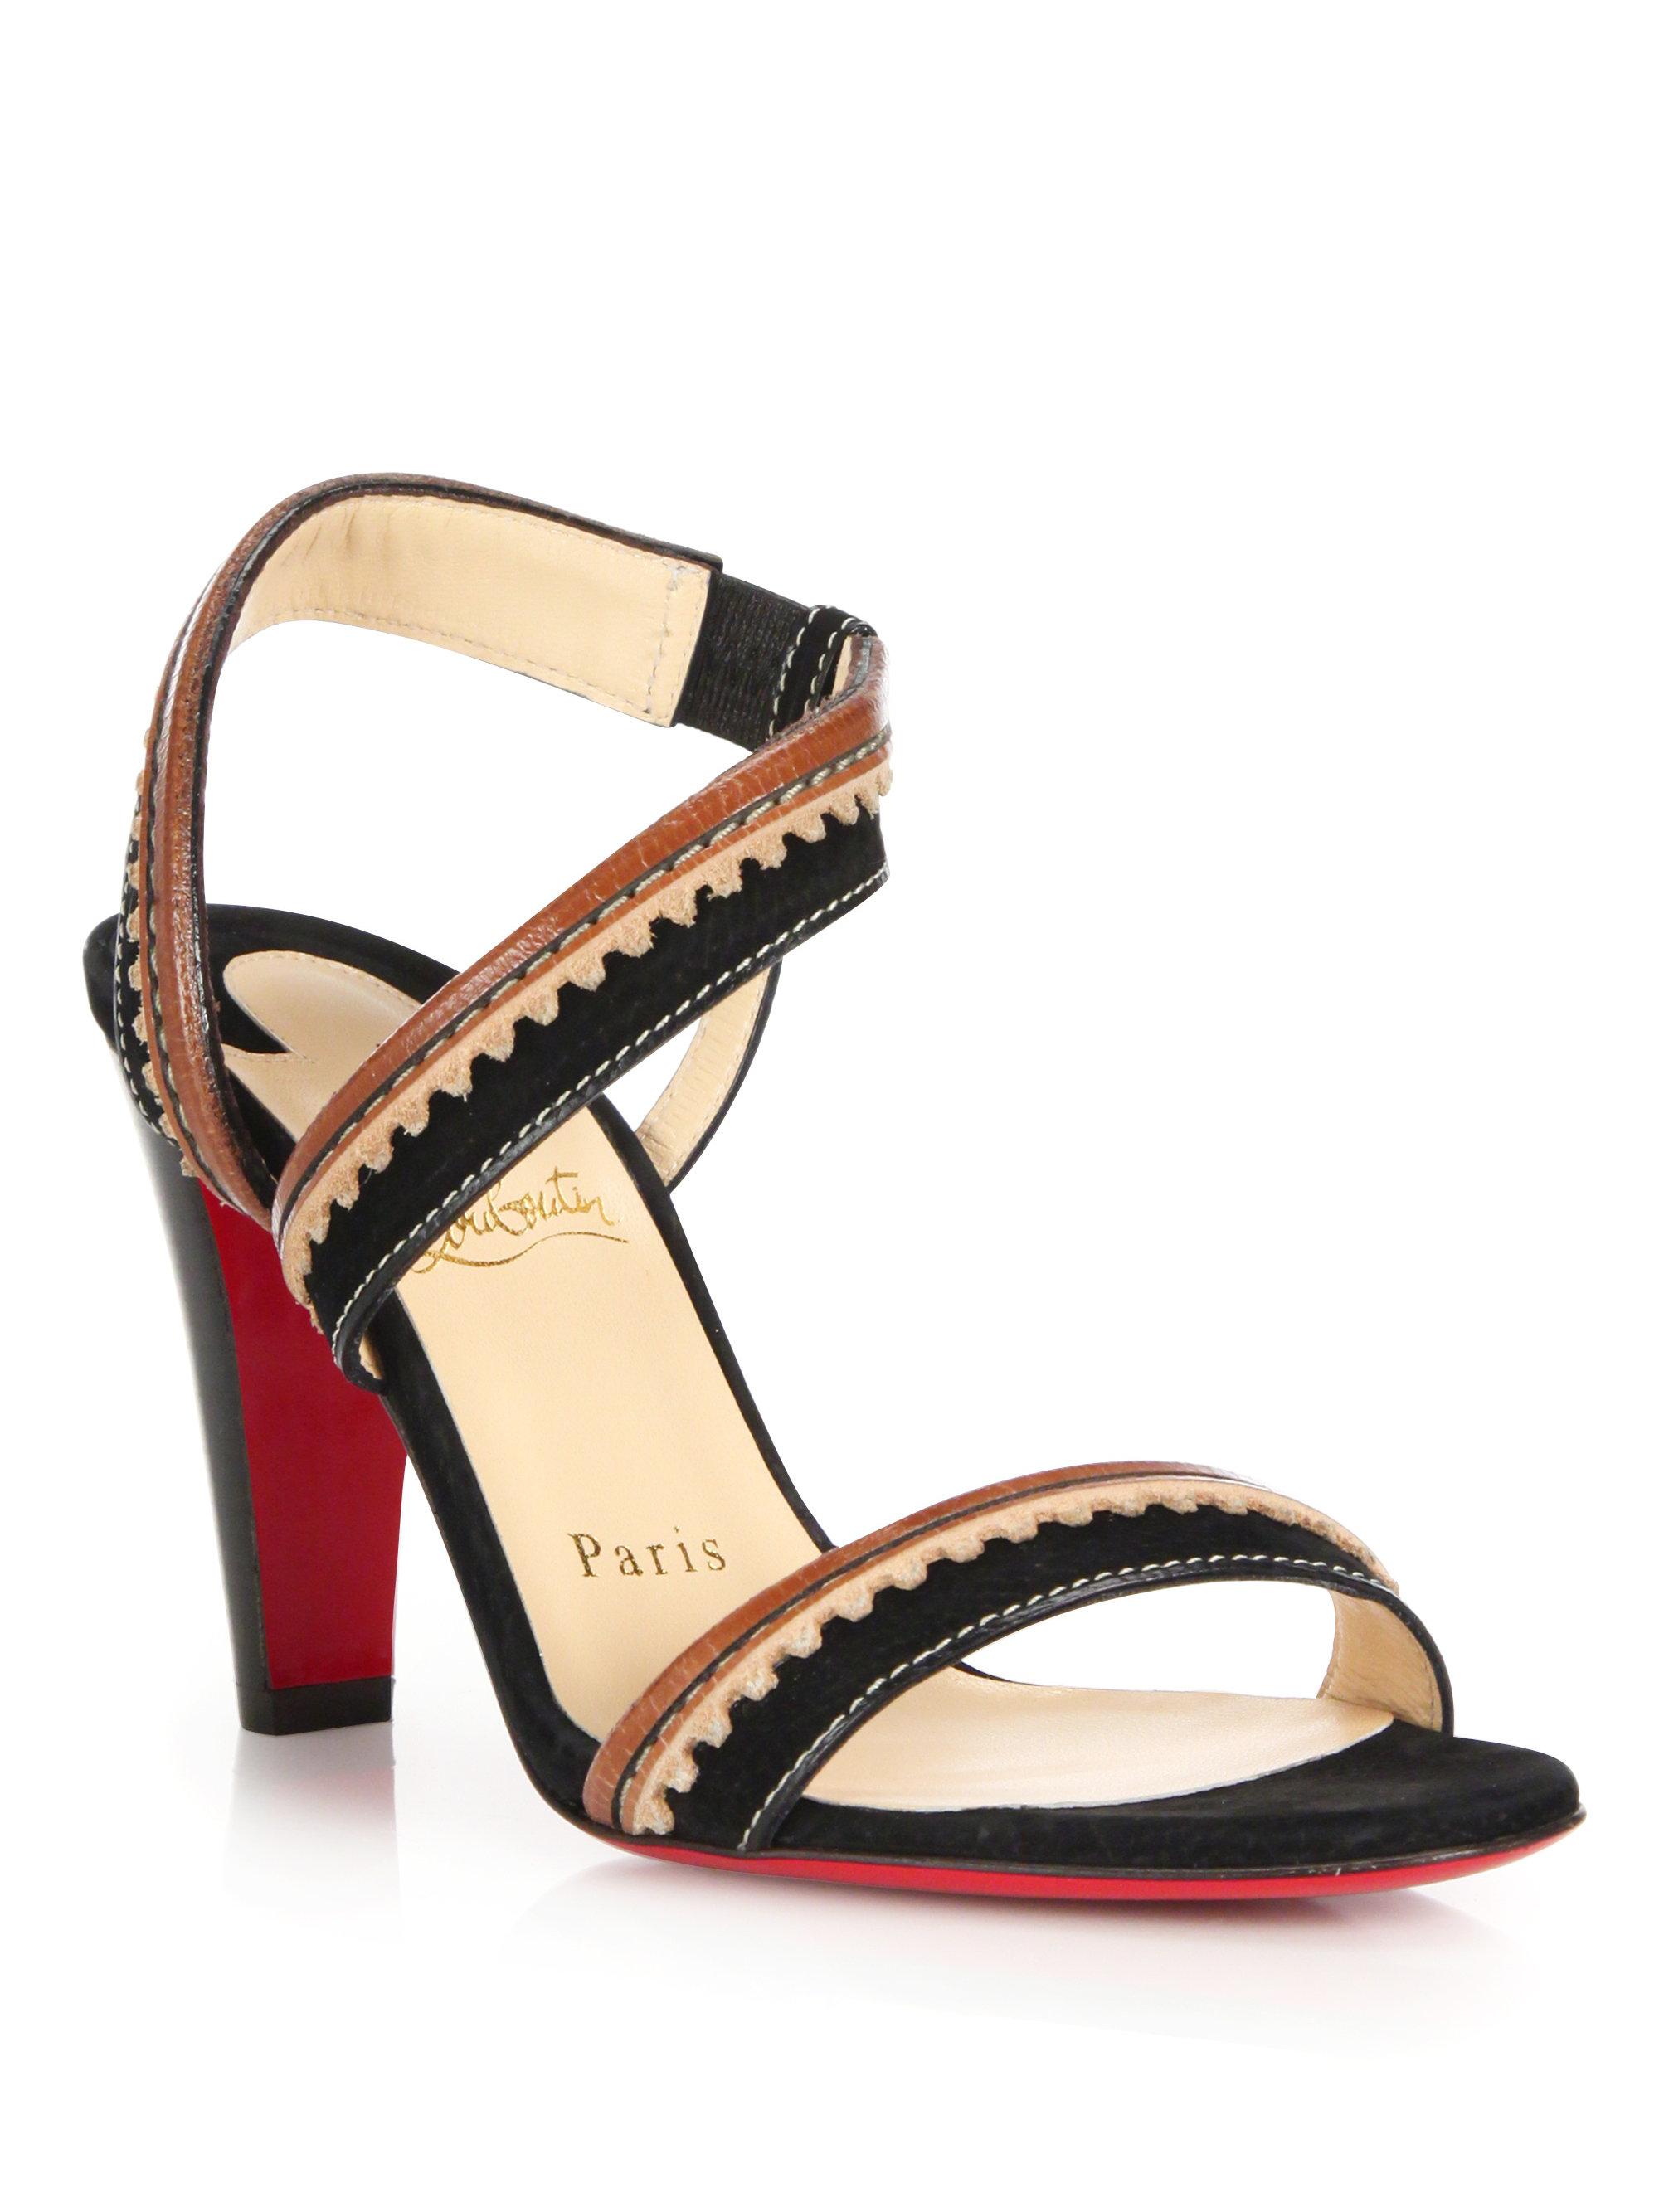 c9d6e82b156 Christian Louboutin Brown Trepi City Suede & Leather Sandals